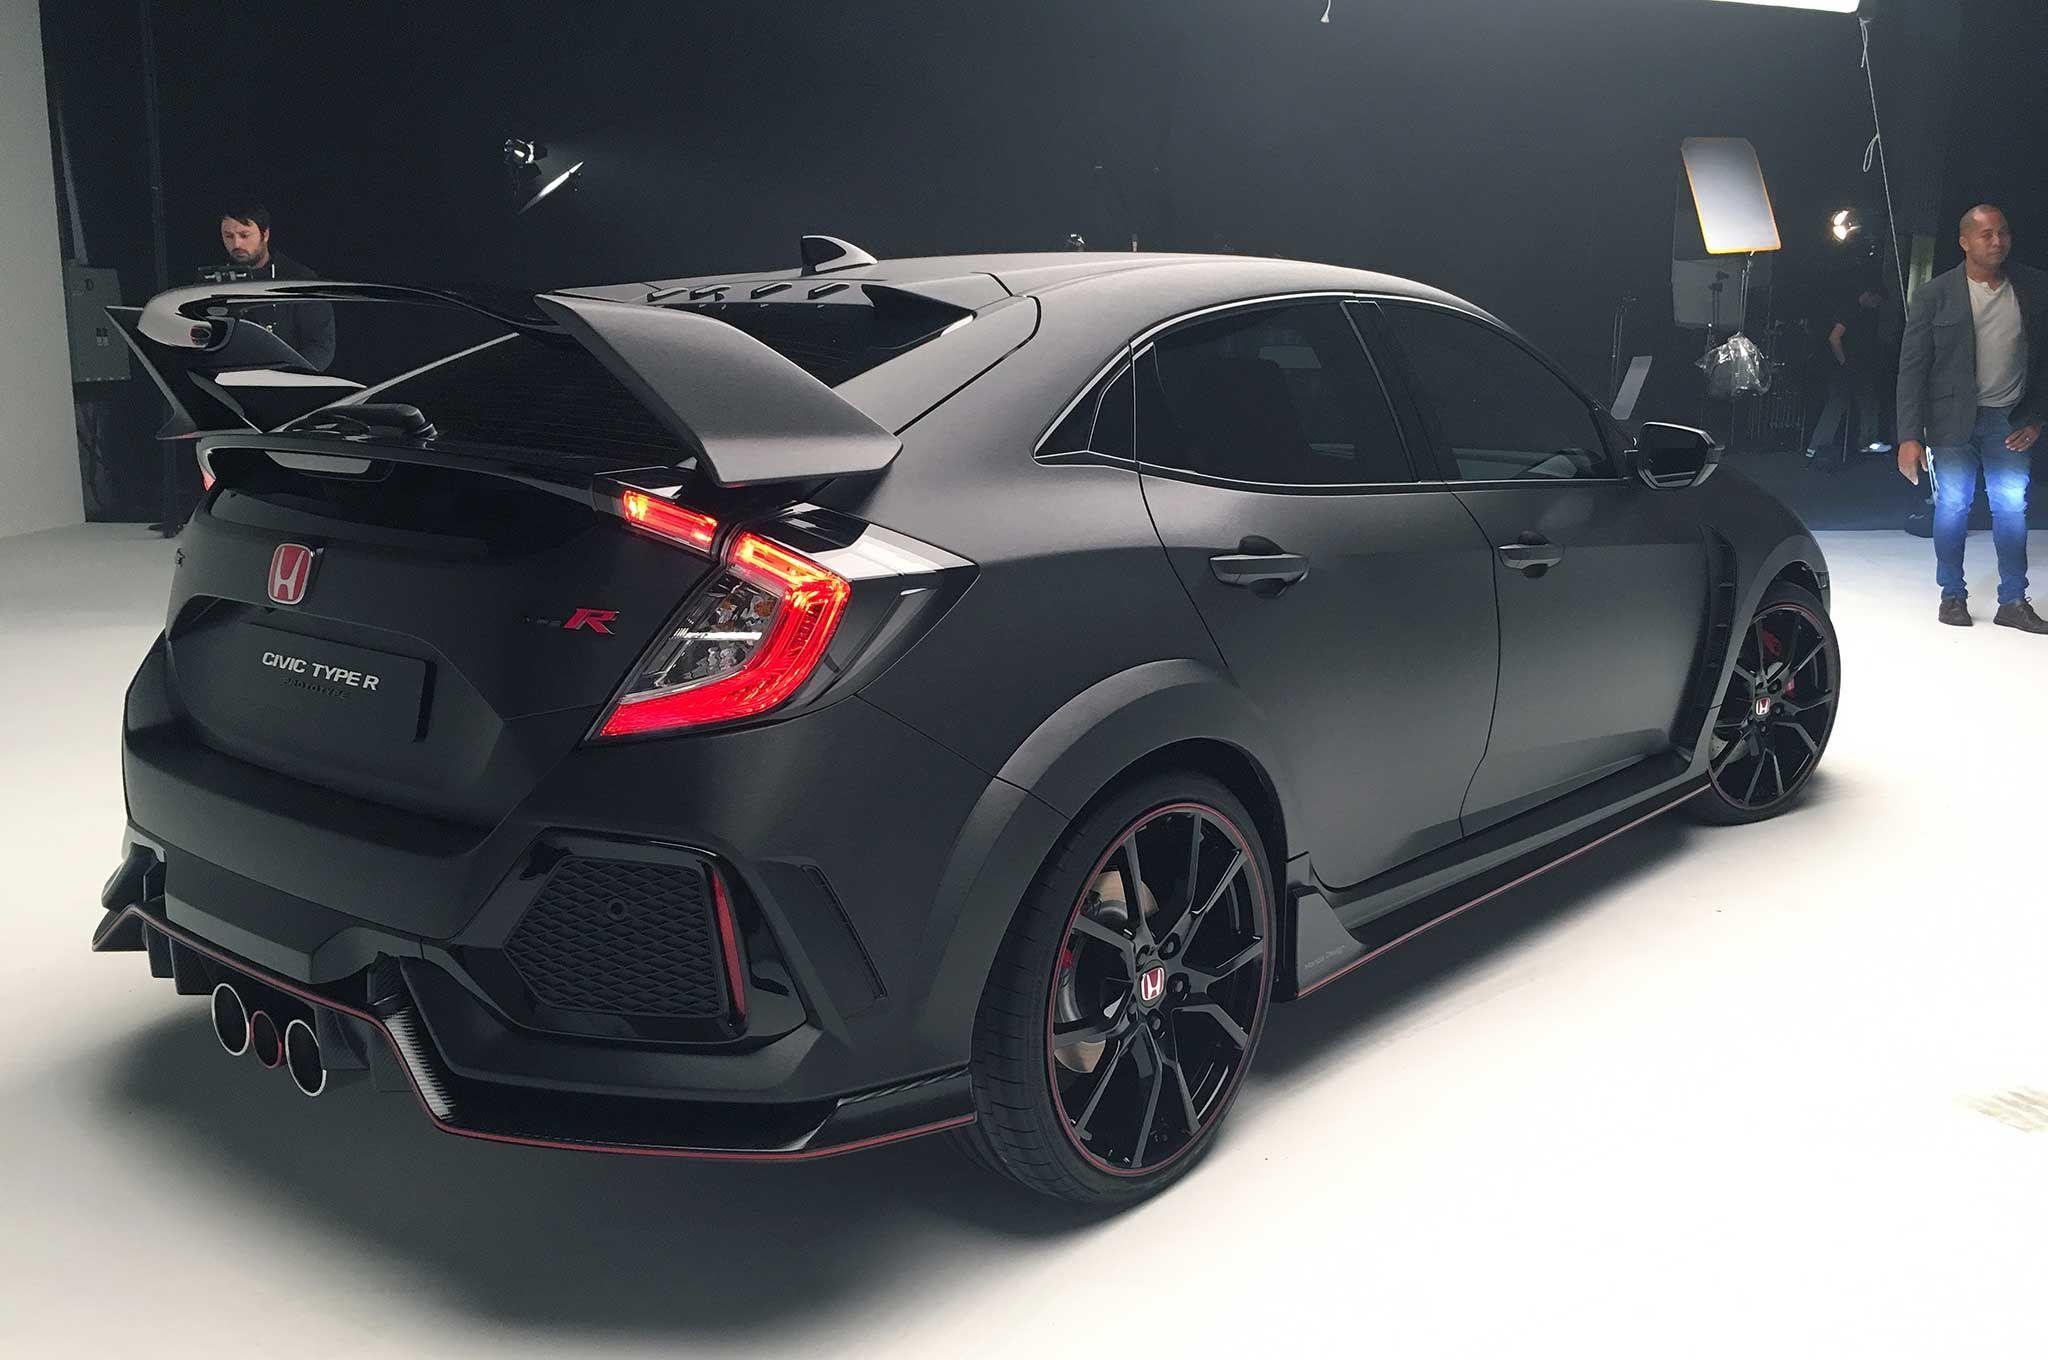 Honda civic type r rear wing Honda civic type r, Honda